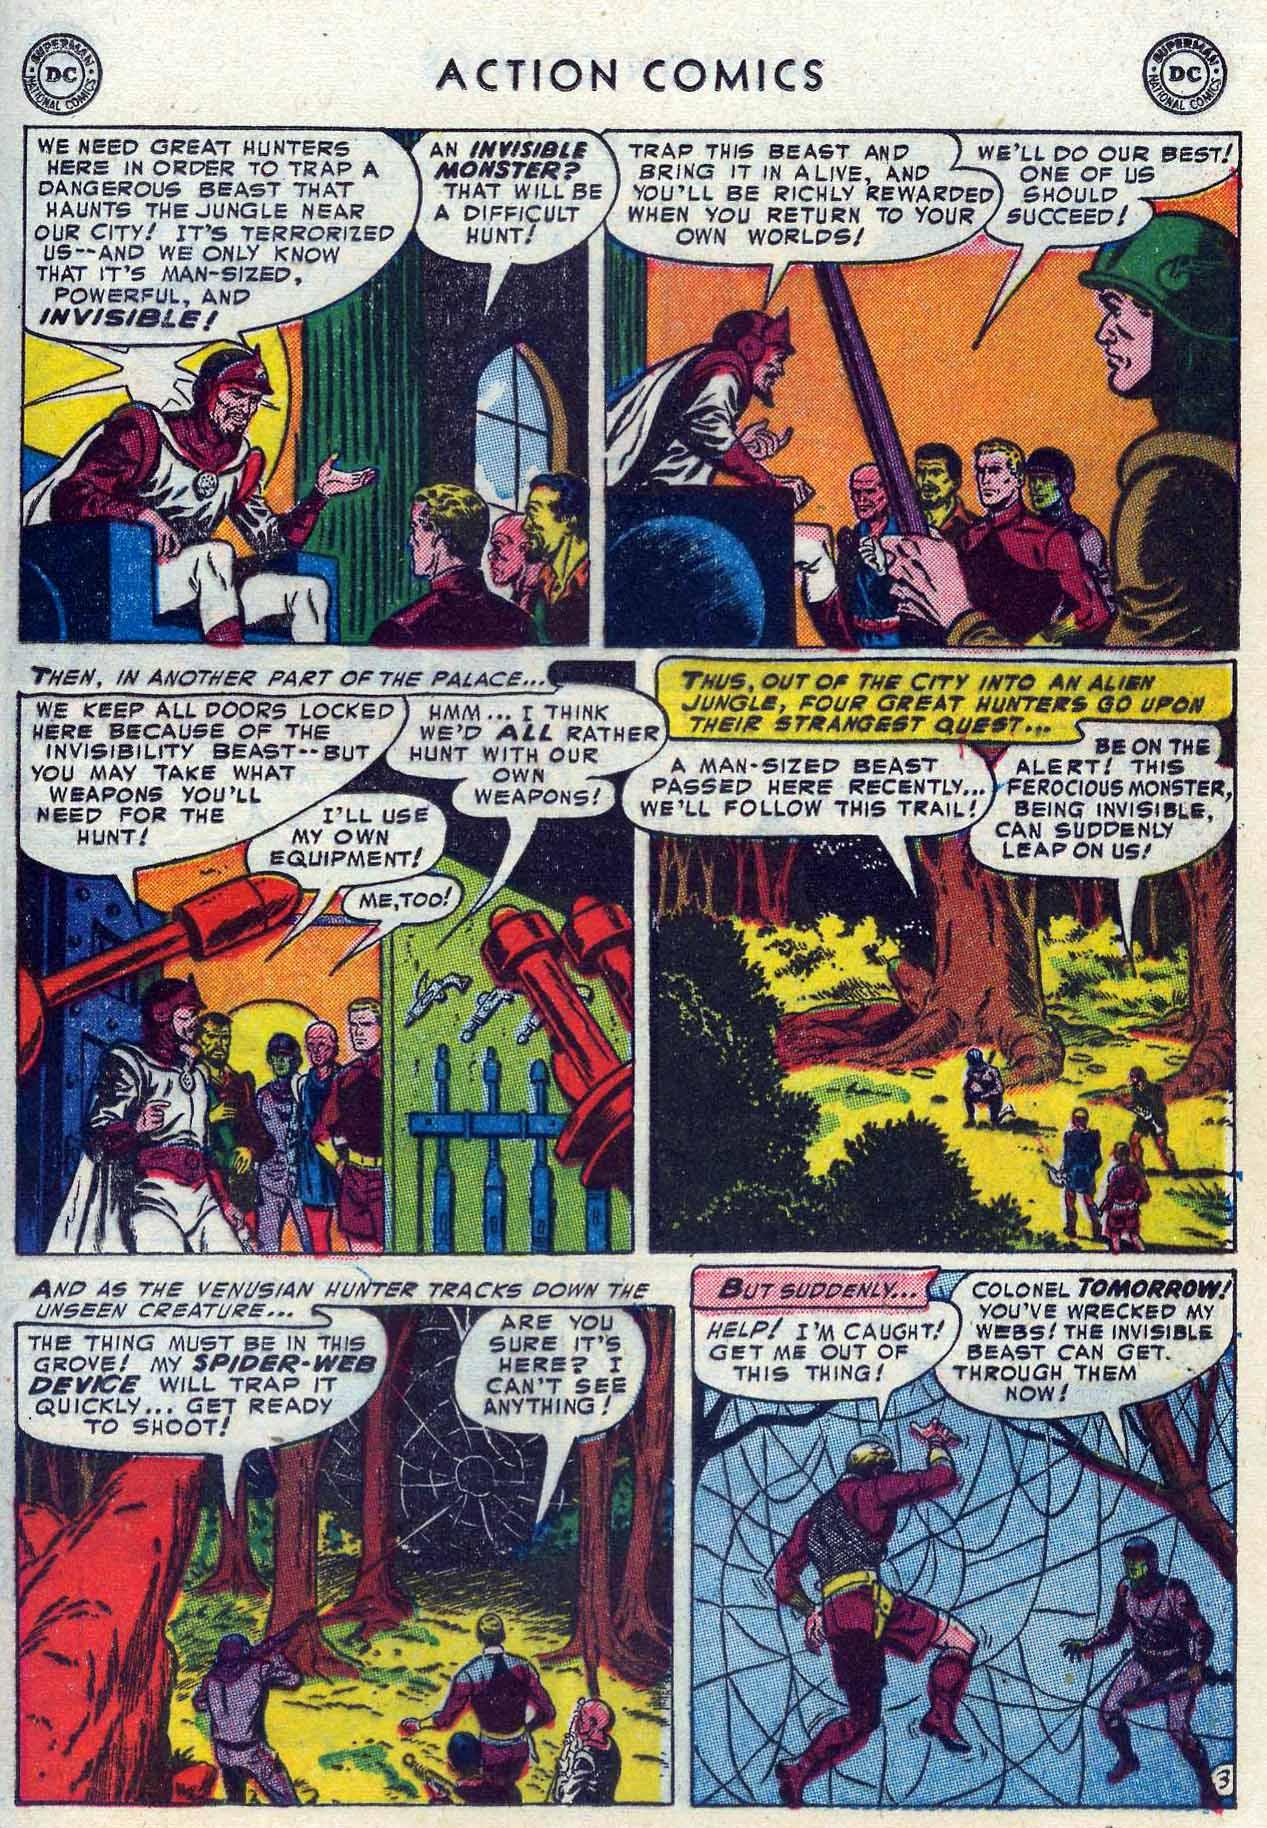 Action Comics (1938) 190 Page 26